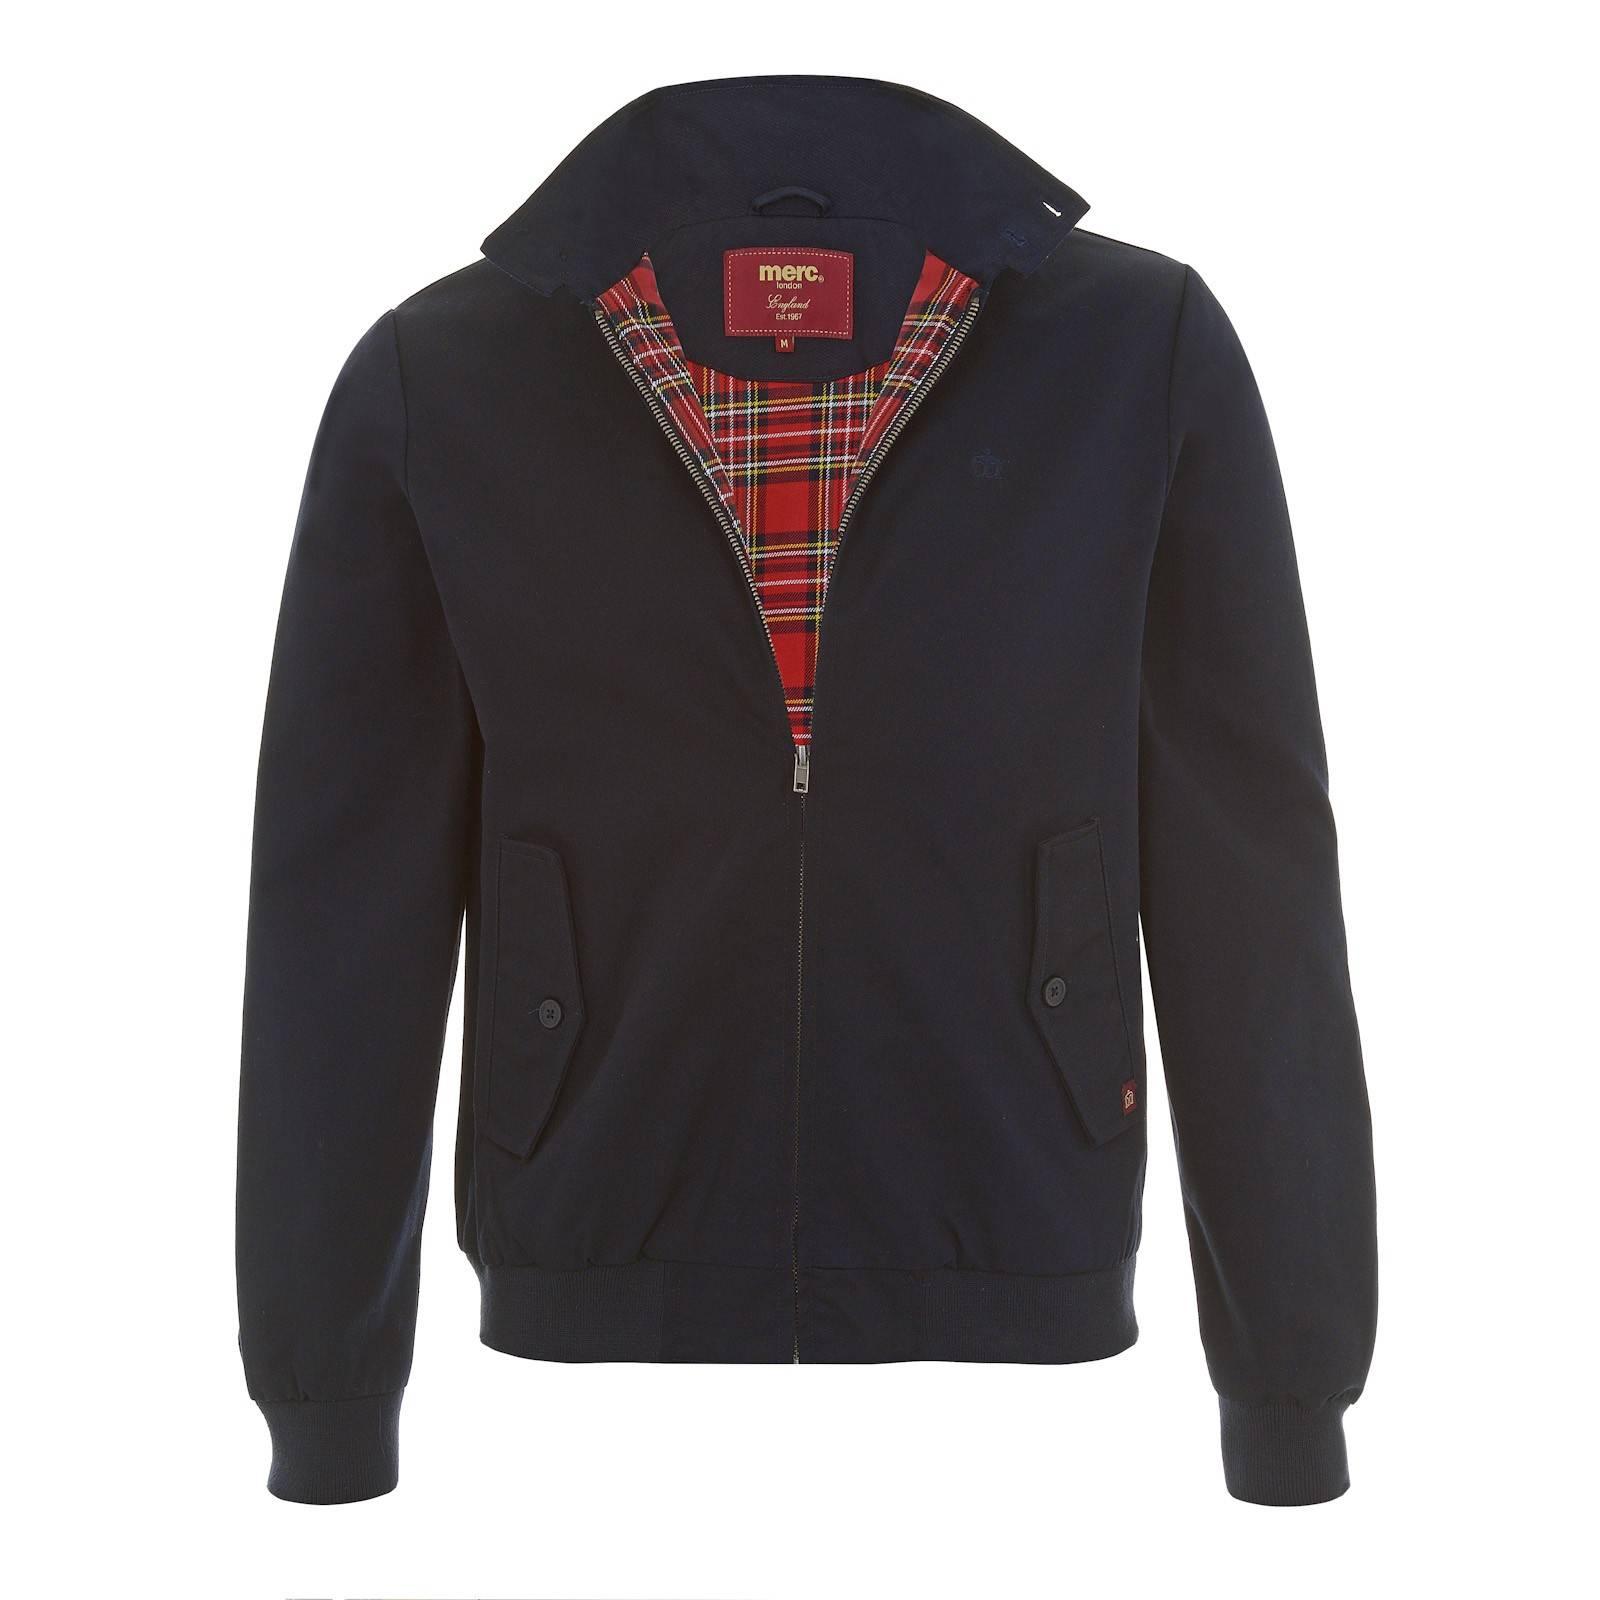 Куртка HarringtonСлайдер на главной<br><br><br>Артикул: 1104106<br>Материал: 60% хлопок, 40% полиэстер / Подкладка 100% хлопок<br>Цвет: синий<br>Пол: Мужской